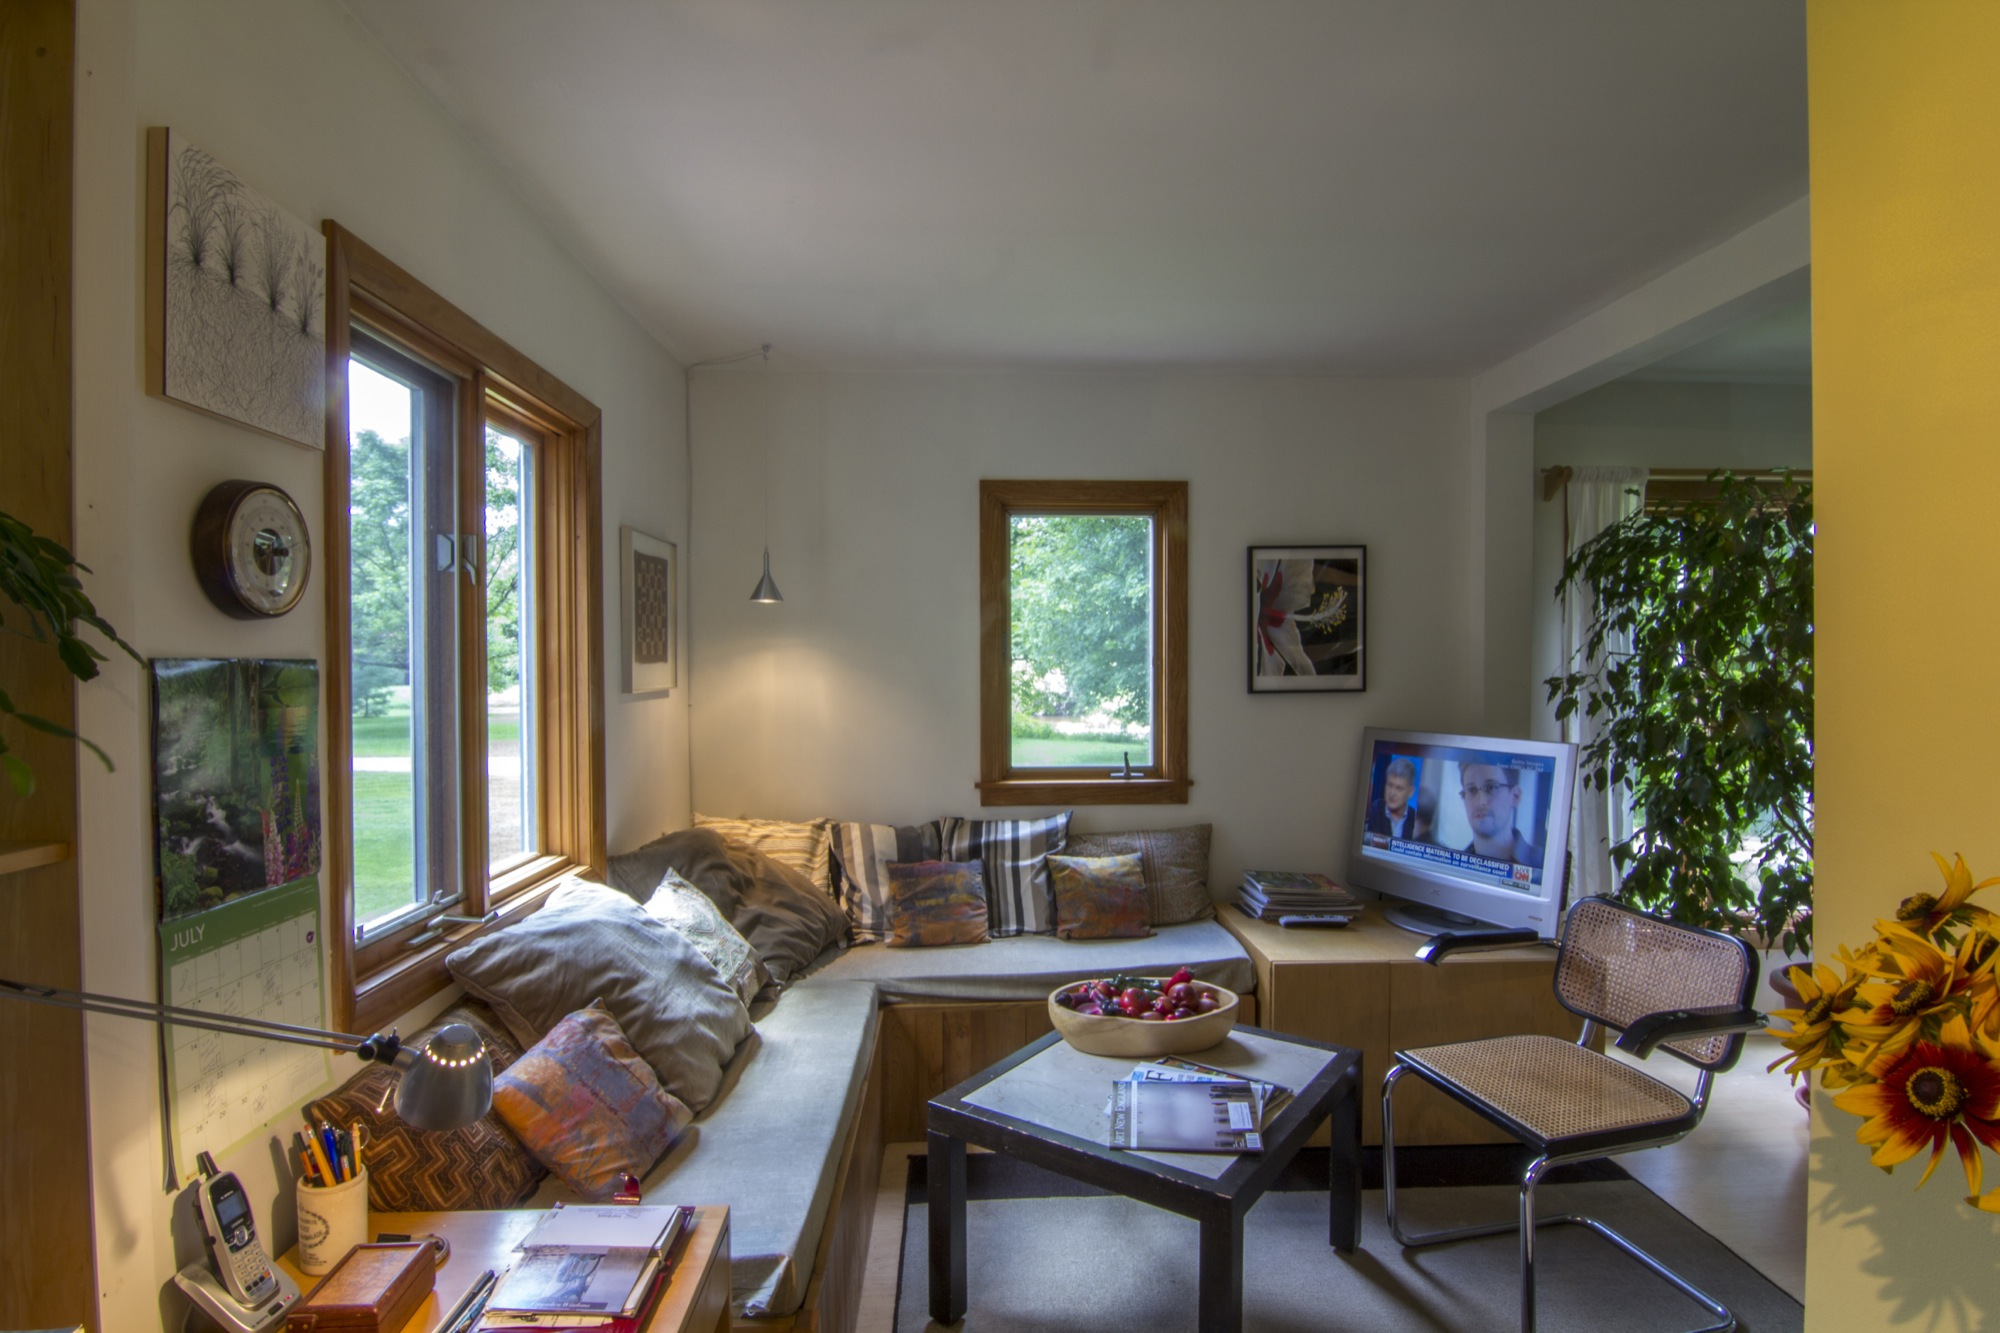 05-IMG_0491 Lipke Sitting Area.jpg